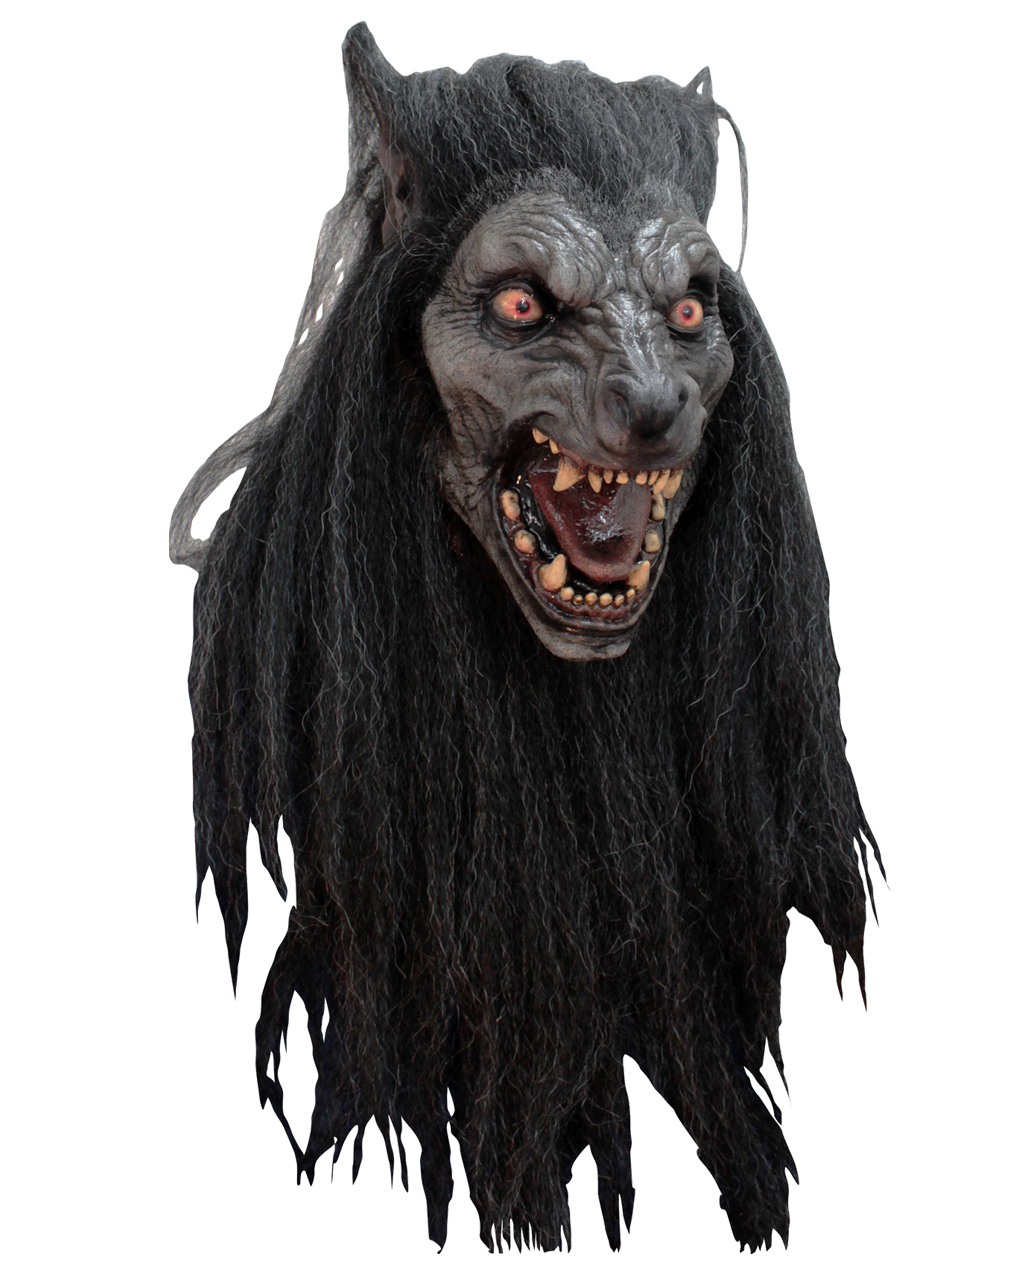 Halloween Maske Werwolf Horrormaske Fasching Horror Maske Karnevalsmaske